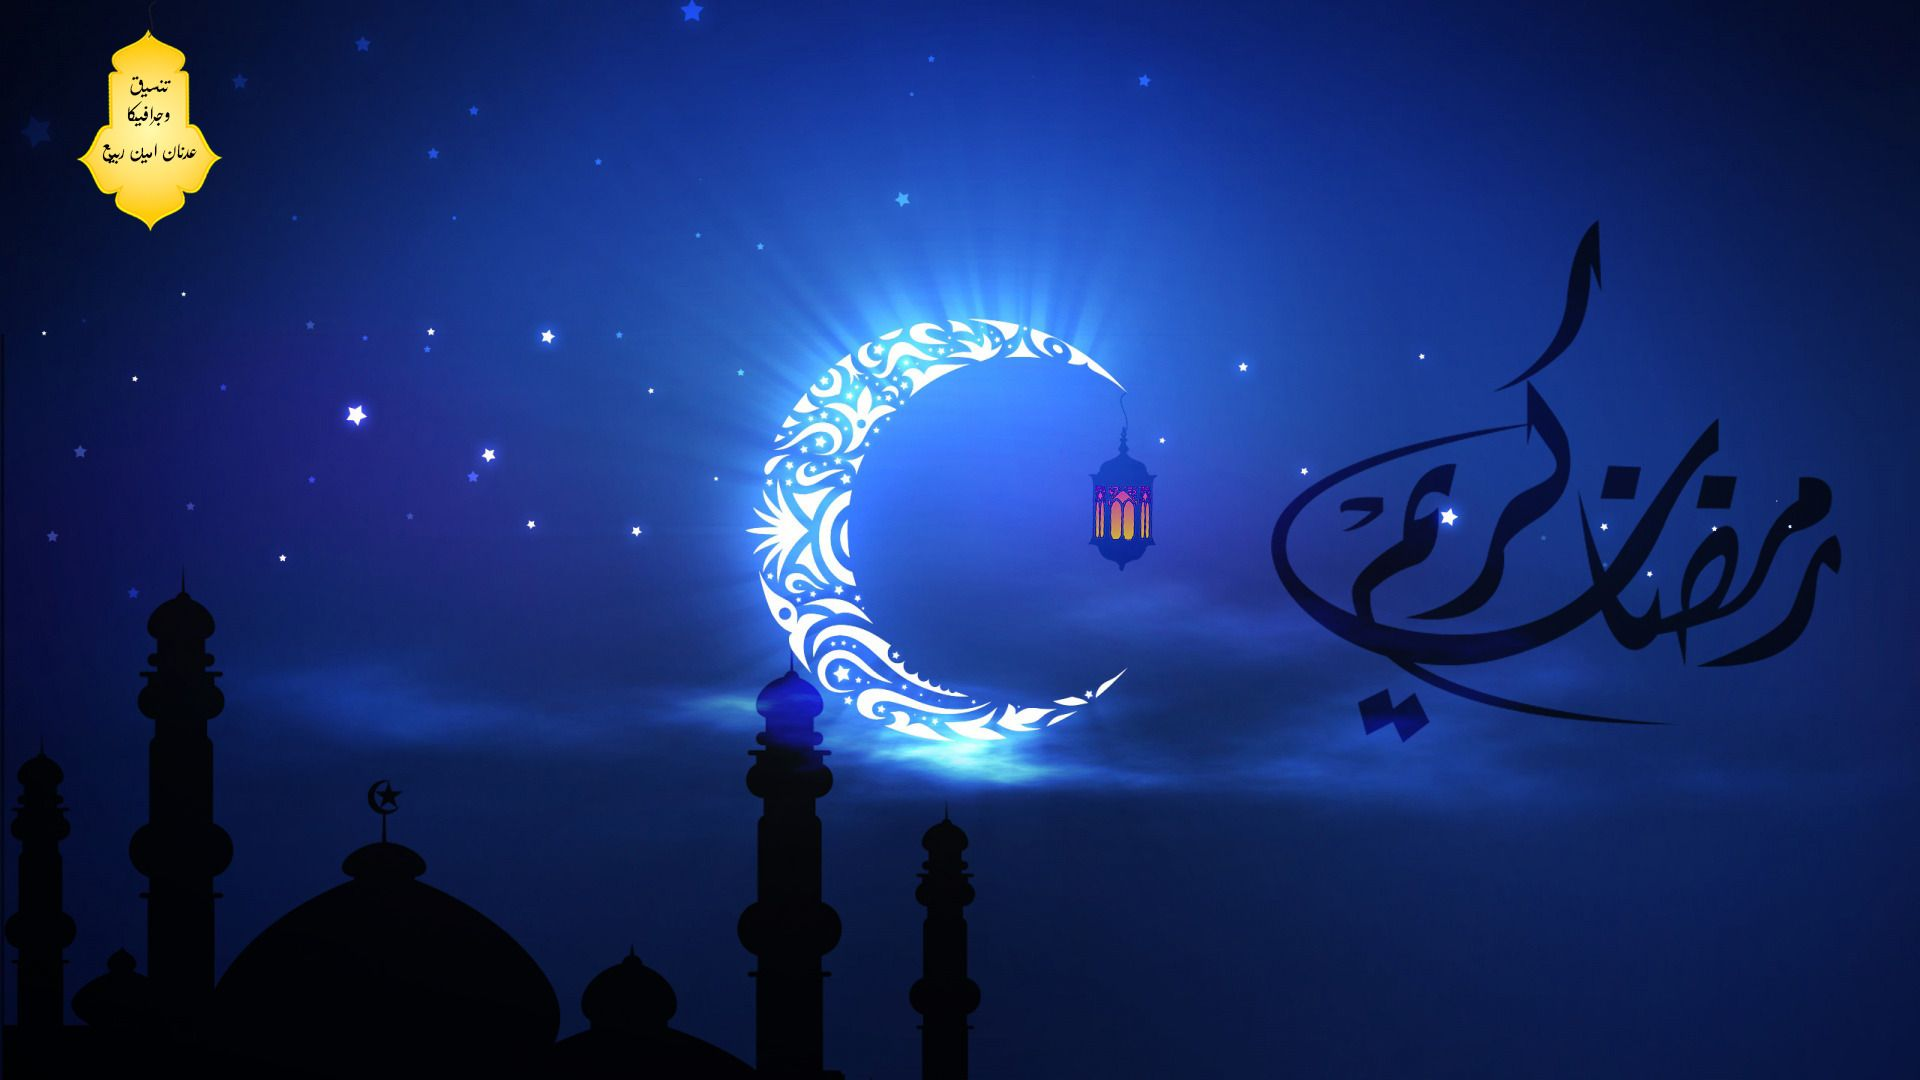 Download HD Ramadan Kareem World Wallpapers for your Desktop